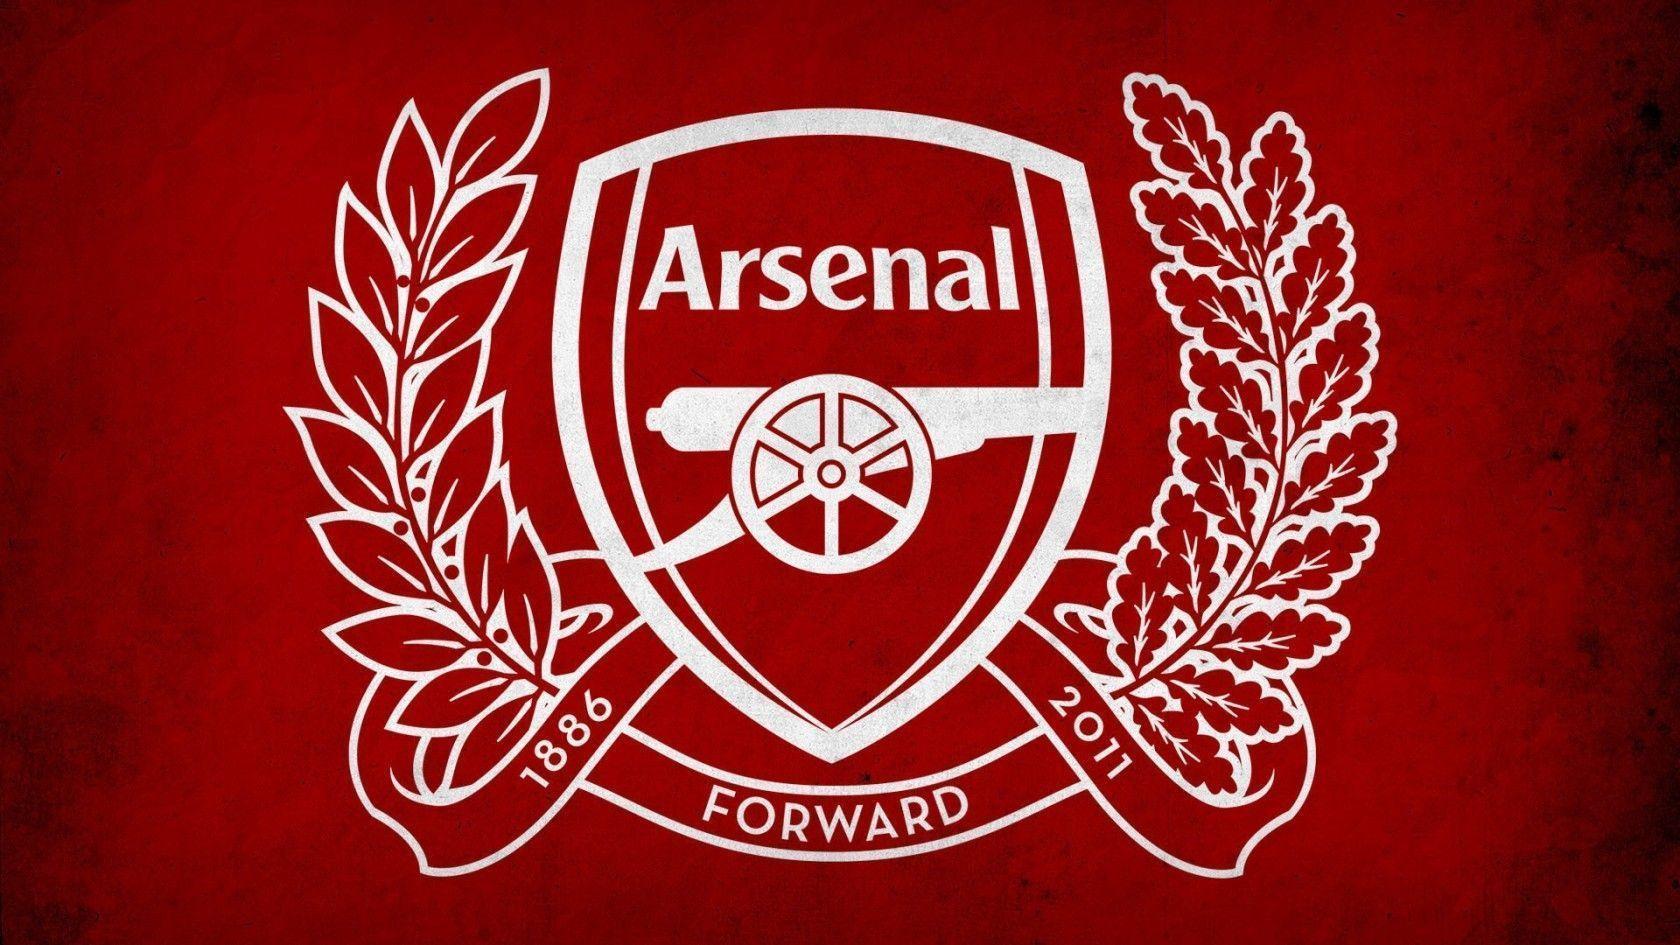 logo arsenal đẹp nhất